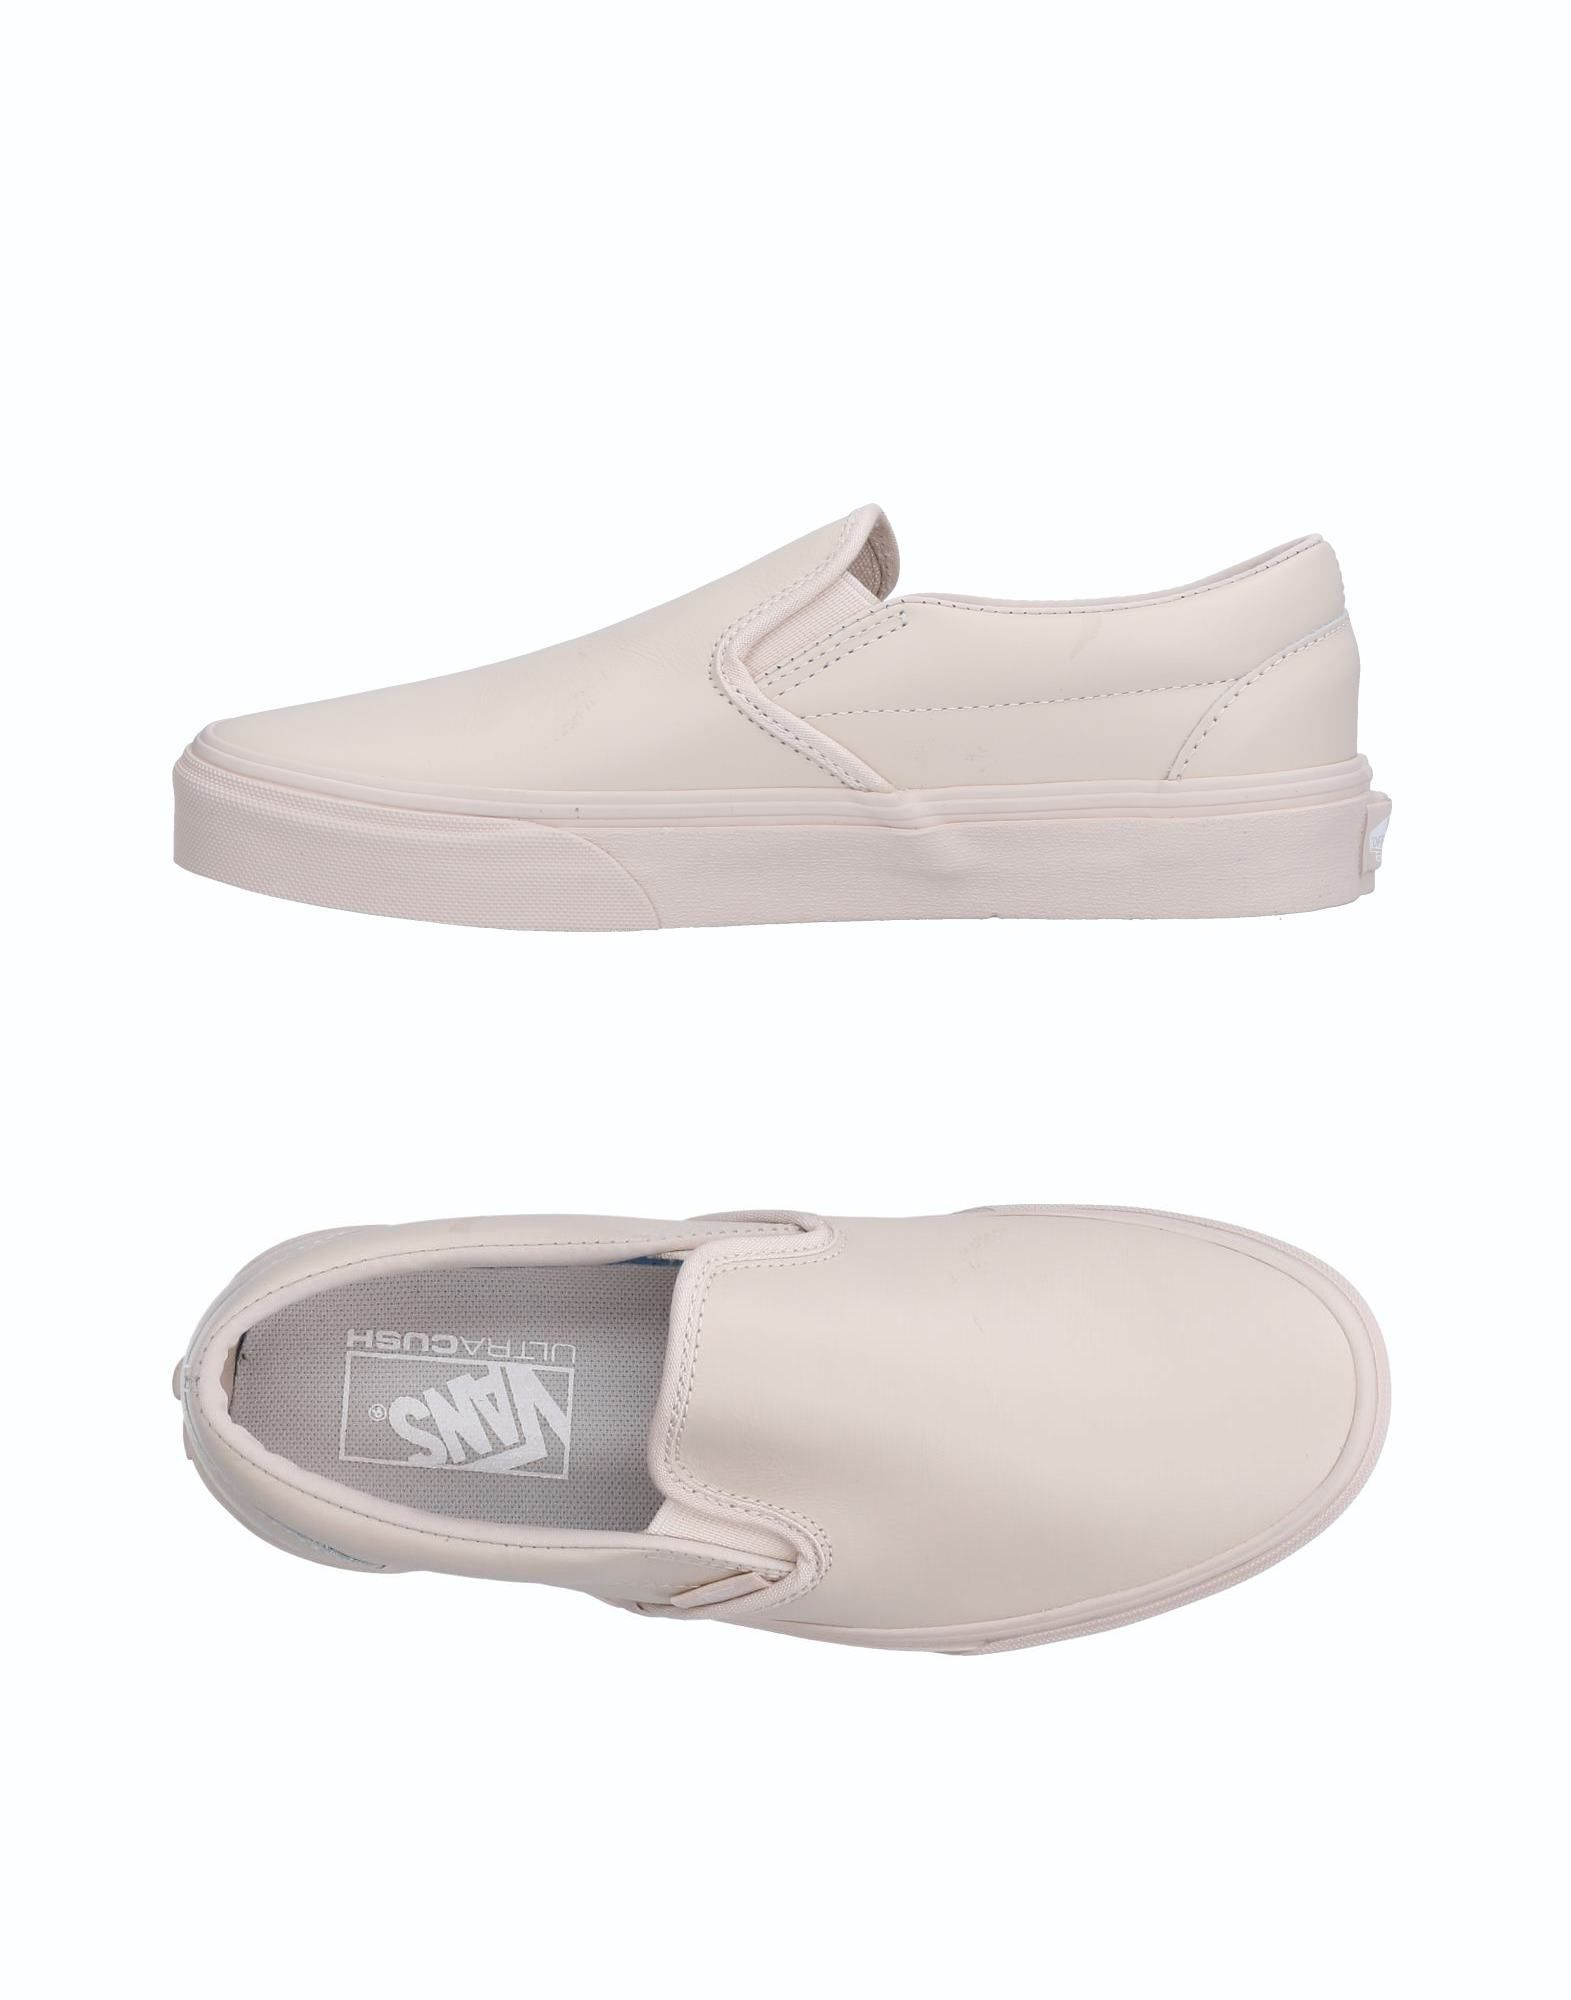 Moda Sneakers Vans Vans Sneakers Donna - 11509963CB bcb146